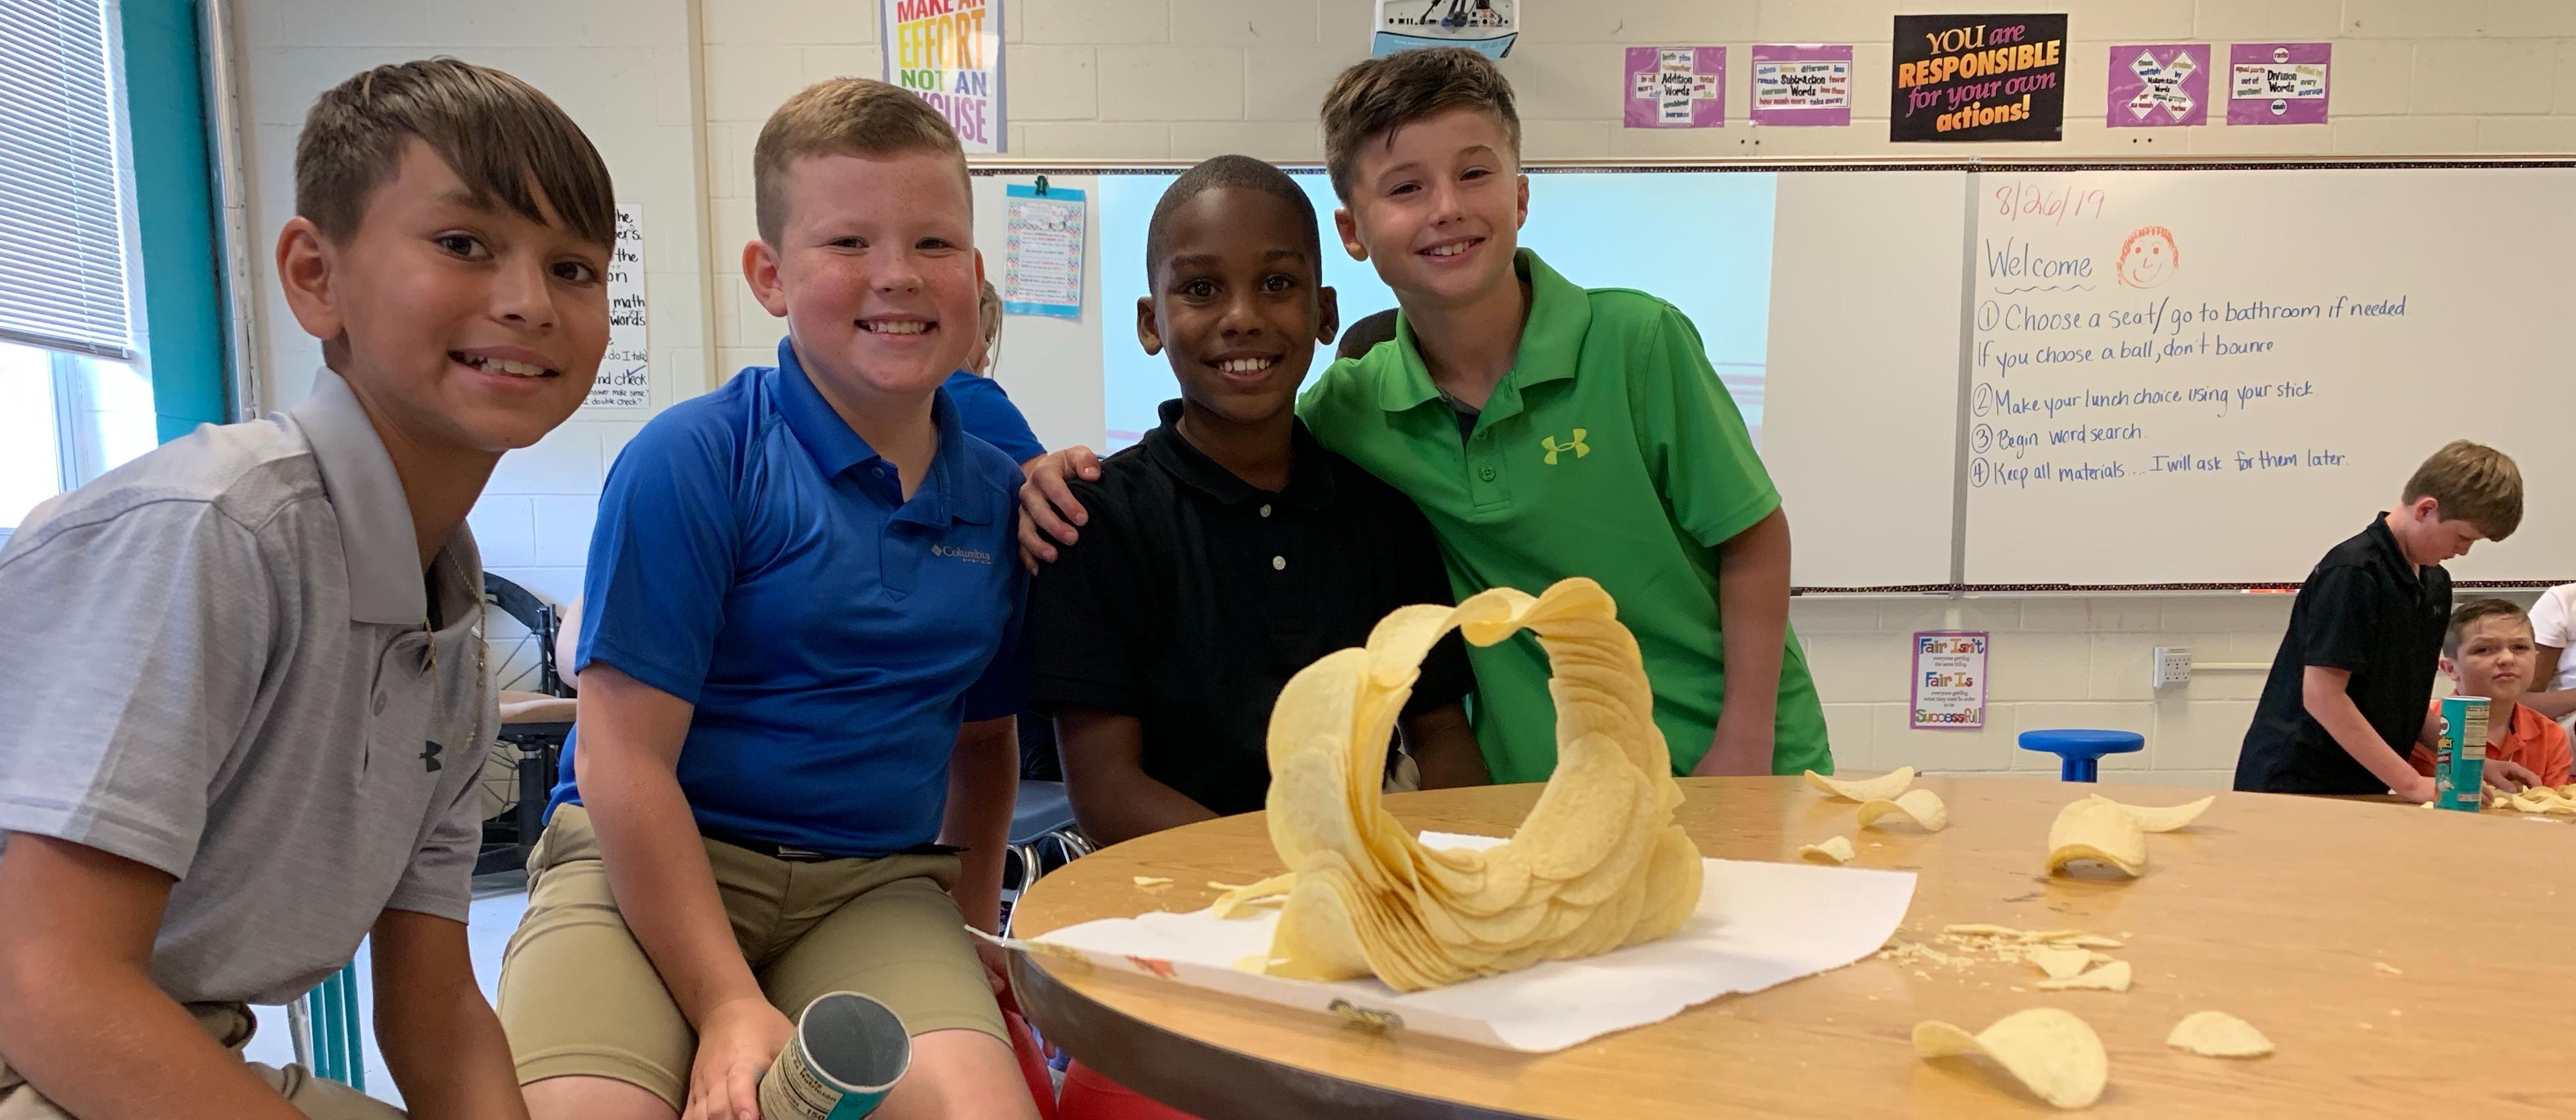 Building Classroom Community & Teamwork!